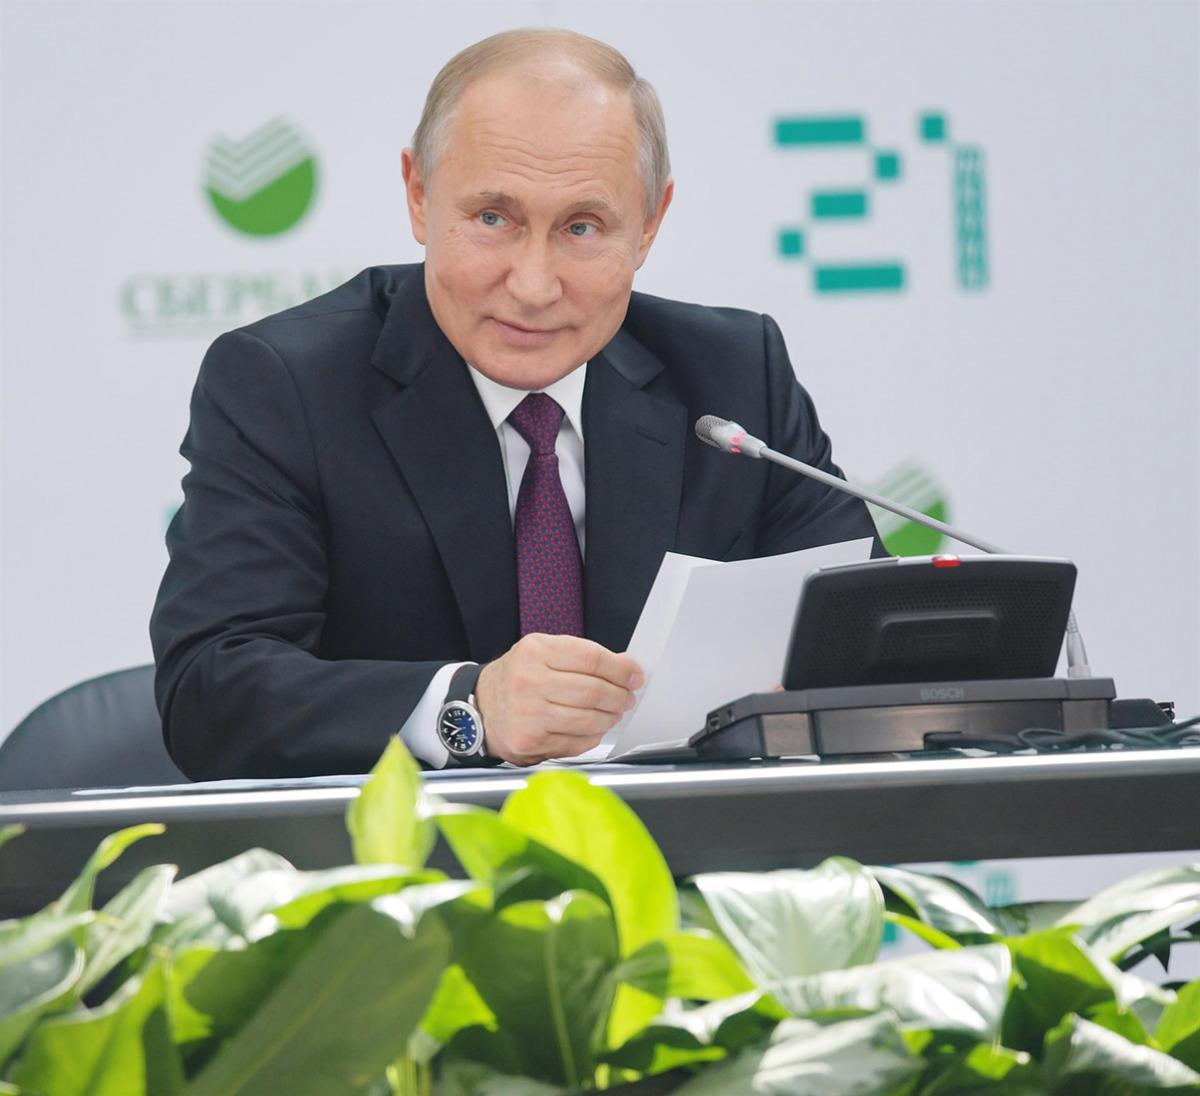 El president rus, Vladimir Putin